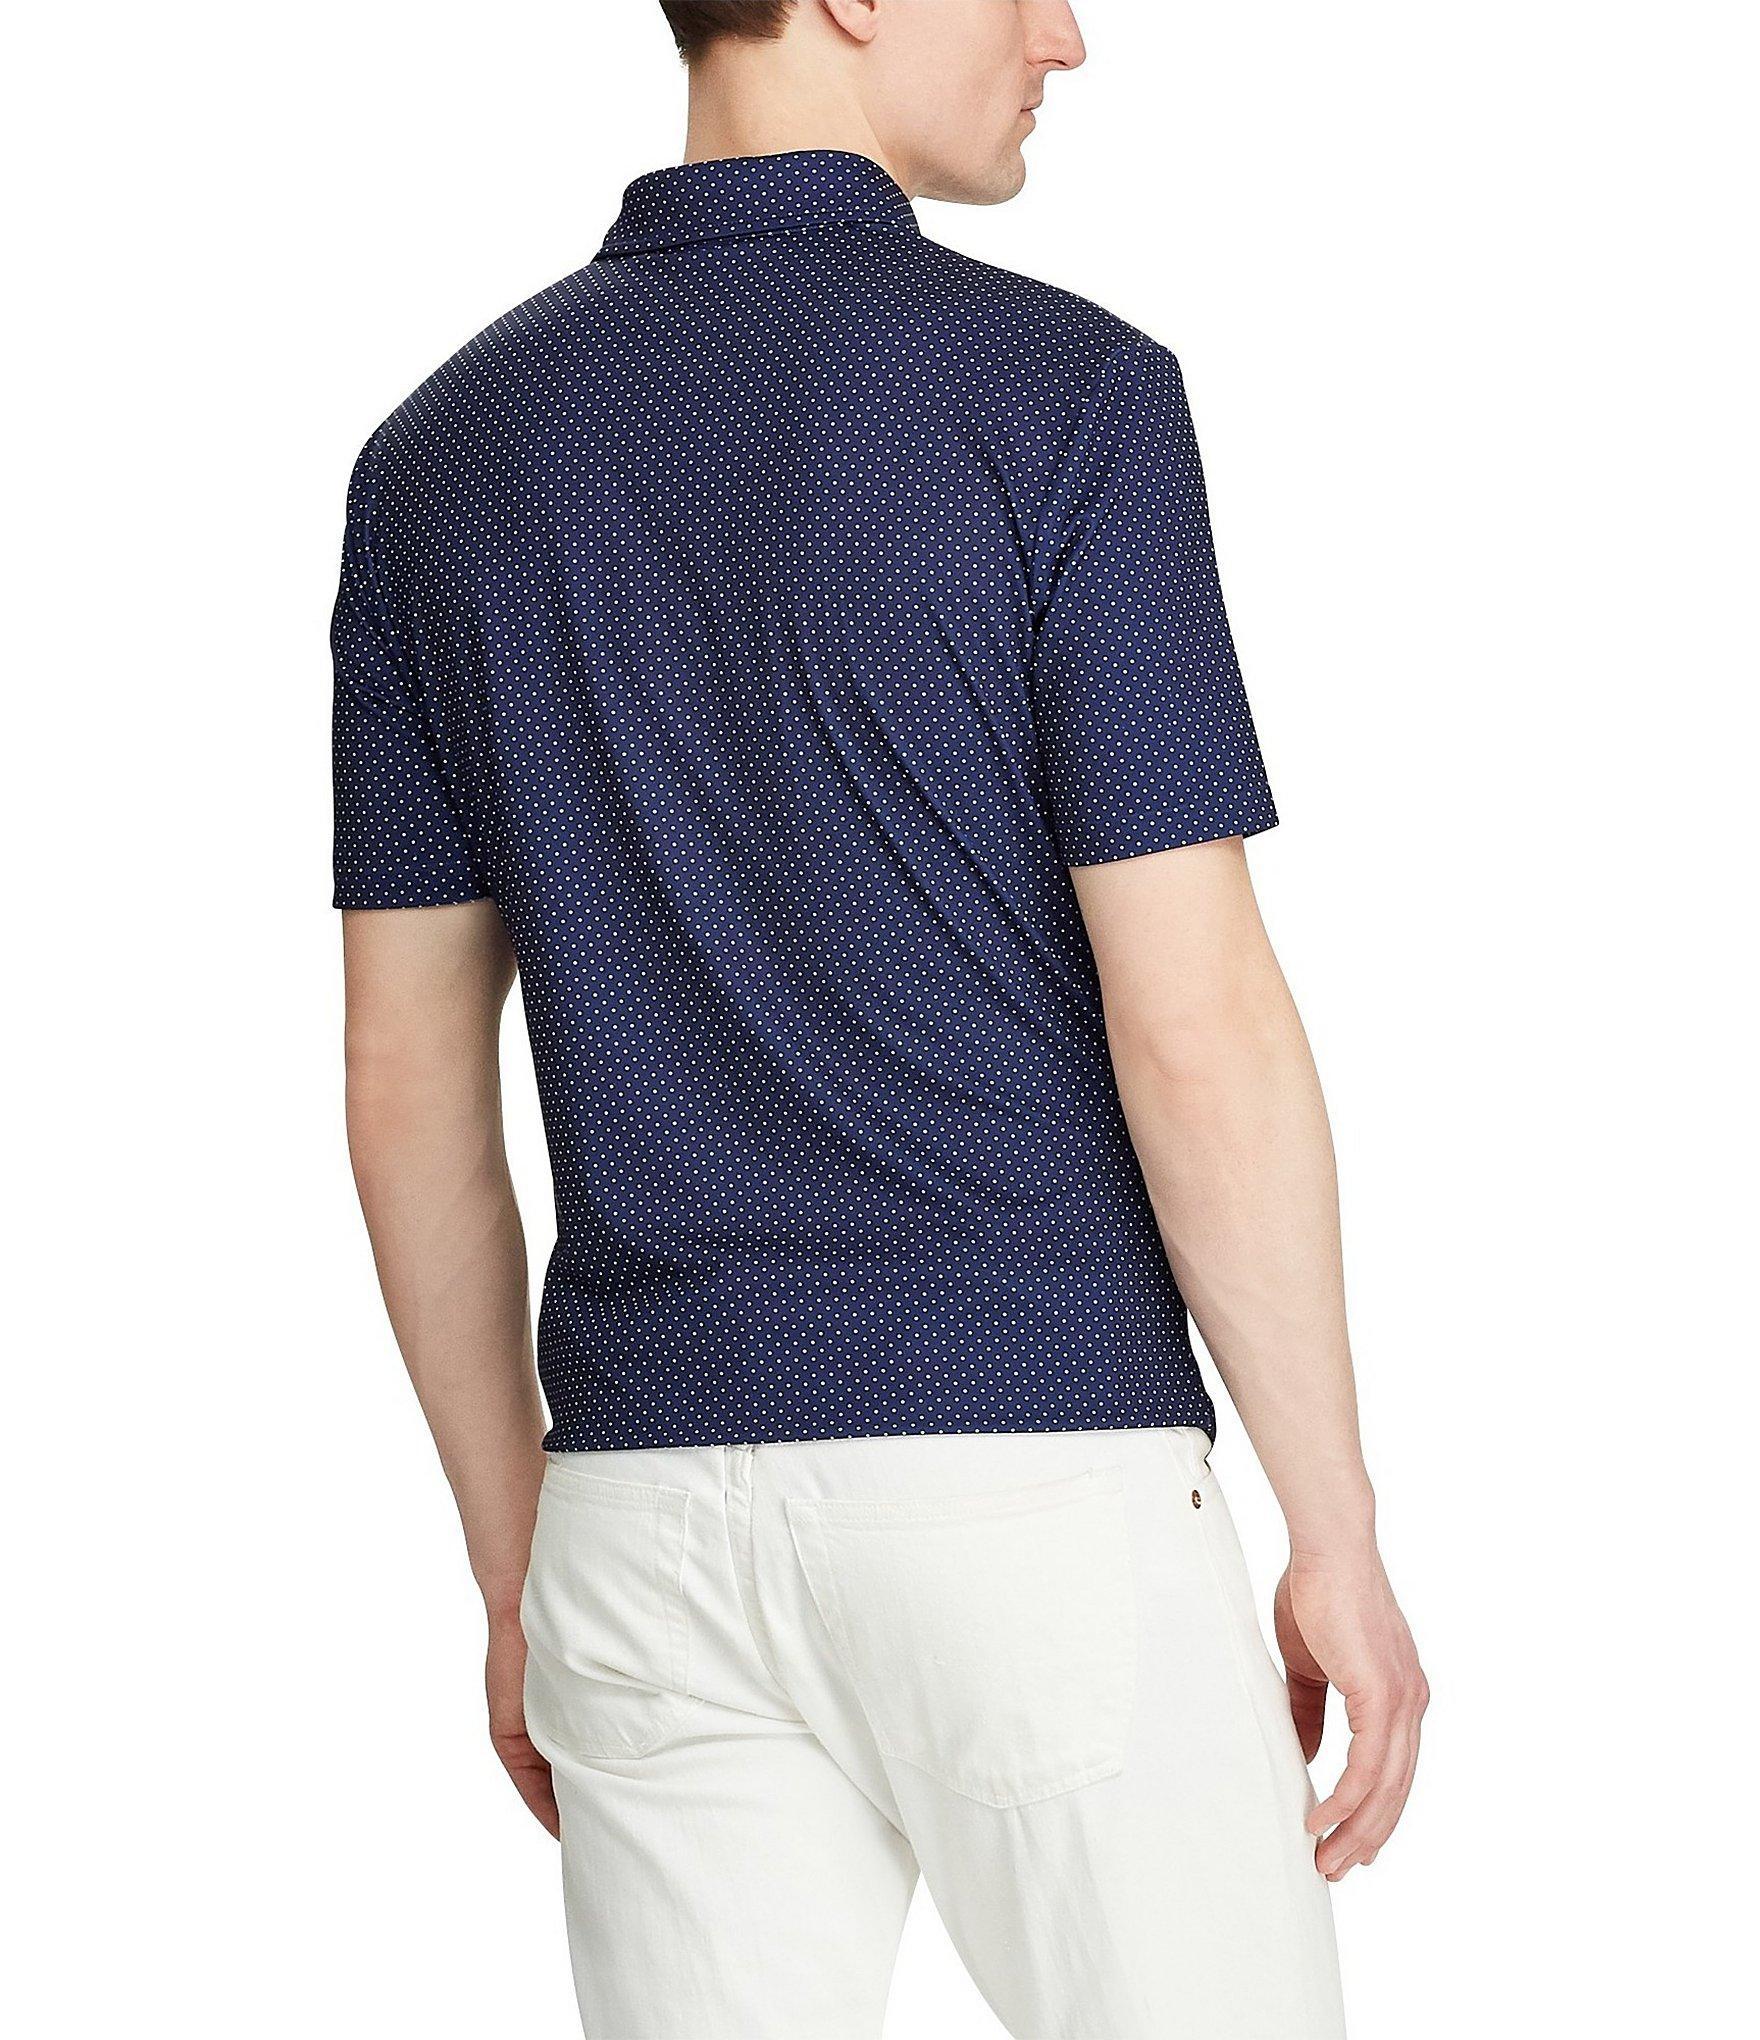 99d14cc16 Polo Ralph Lauren - Blue Polka Dot Performance Short-sleeve Polo Shirt for  Men -. View fullscreen